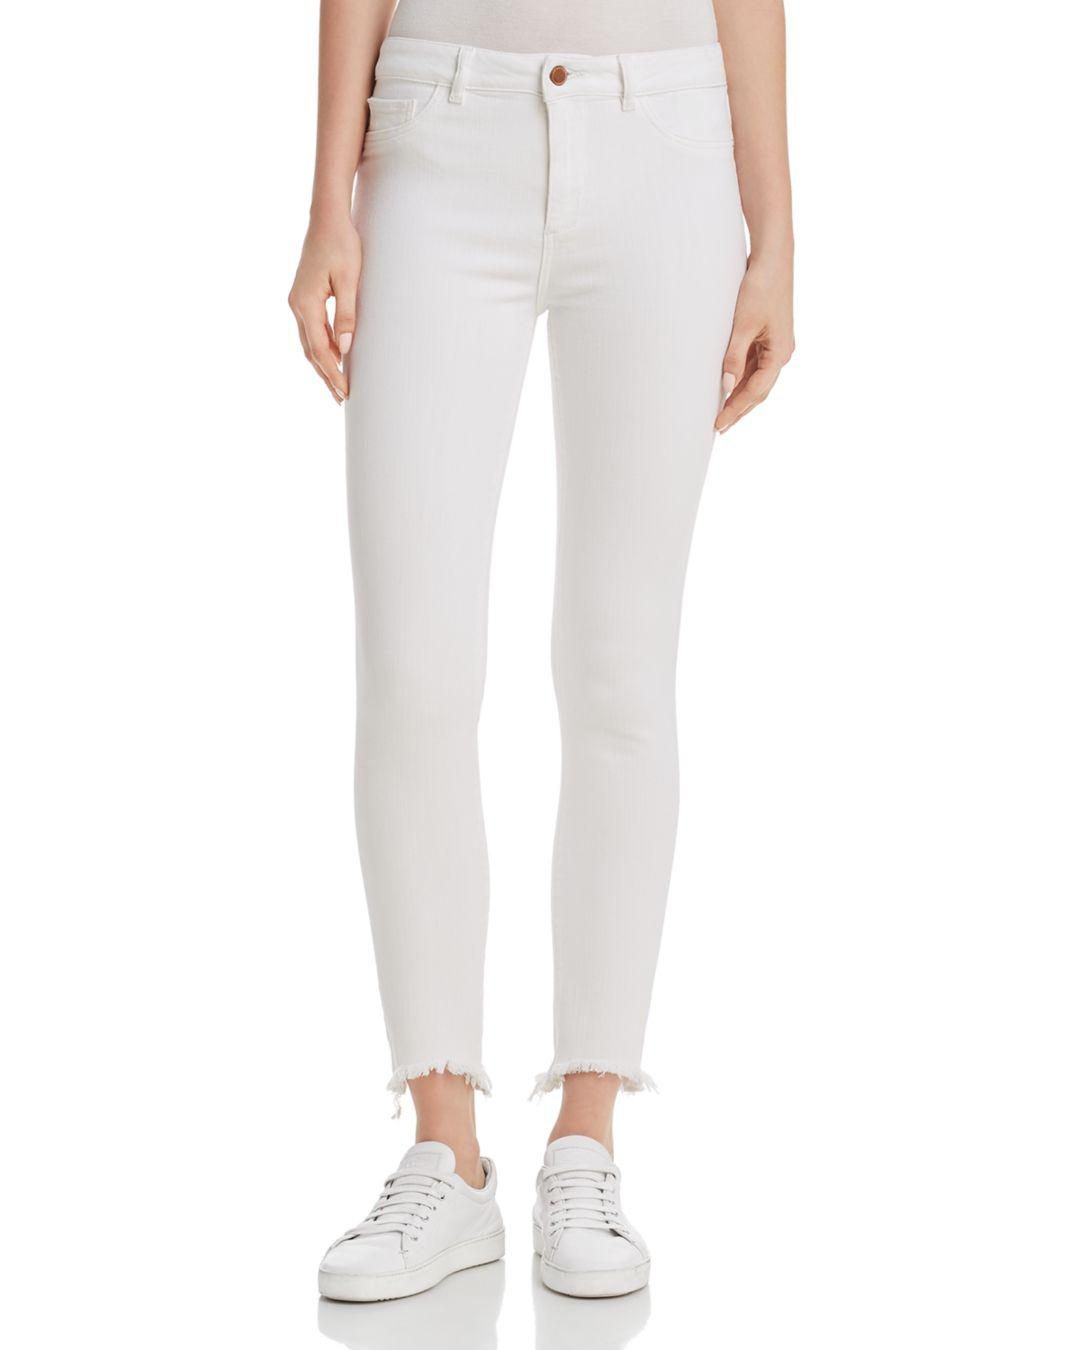 Farrow Instaslim Skinny Ankle Jeans, Eggshell DL Premium Denim